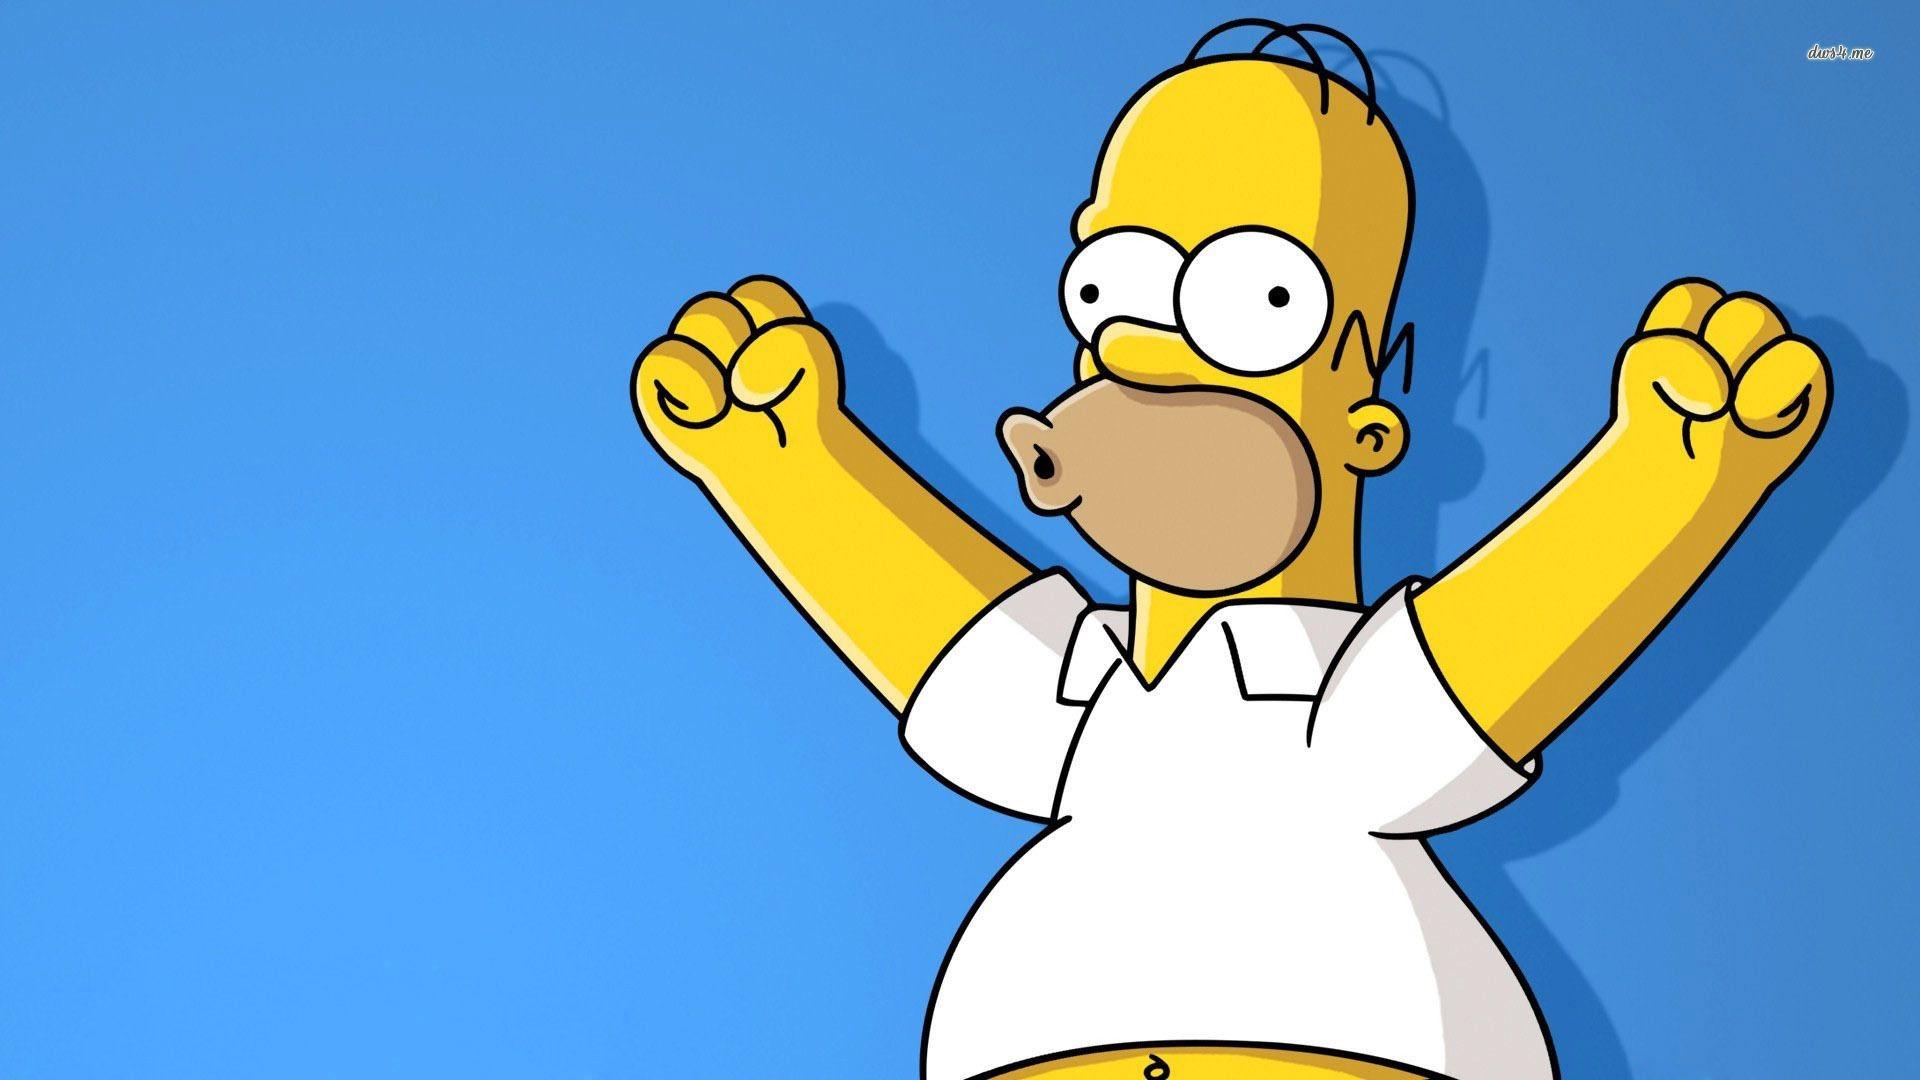 Simpsons iphone Wallpaper